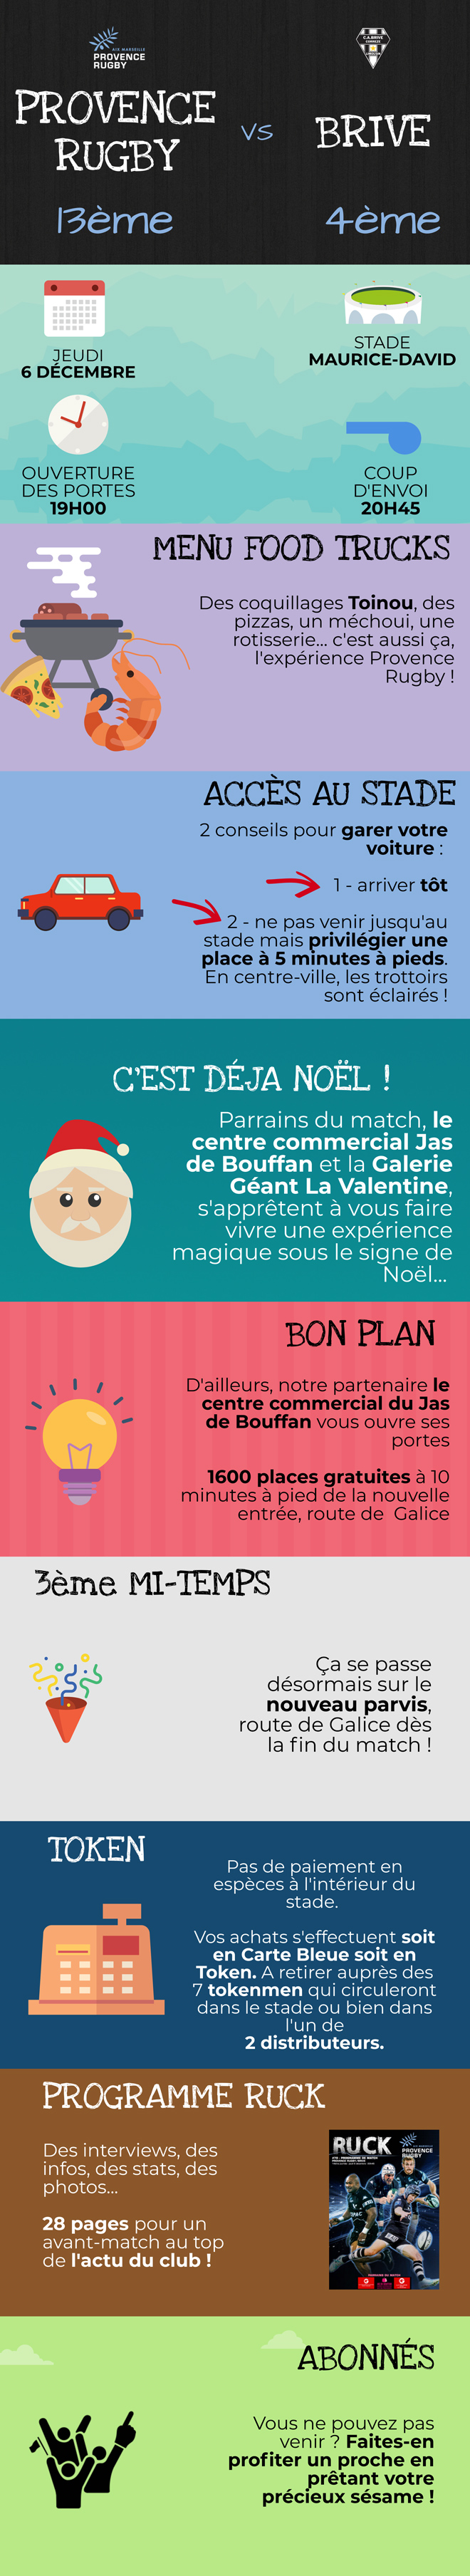 infographie_brive